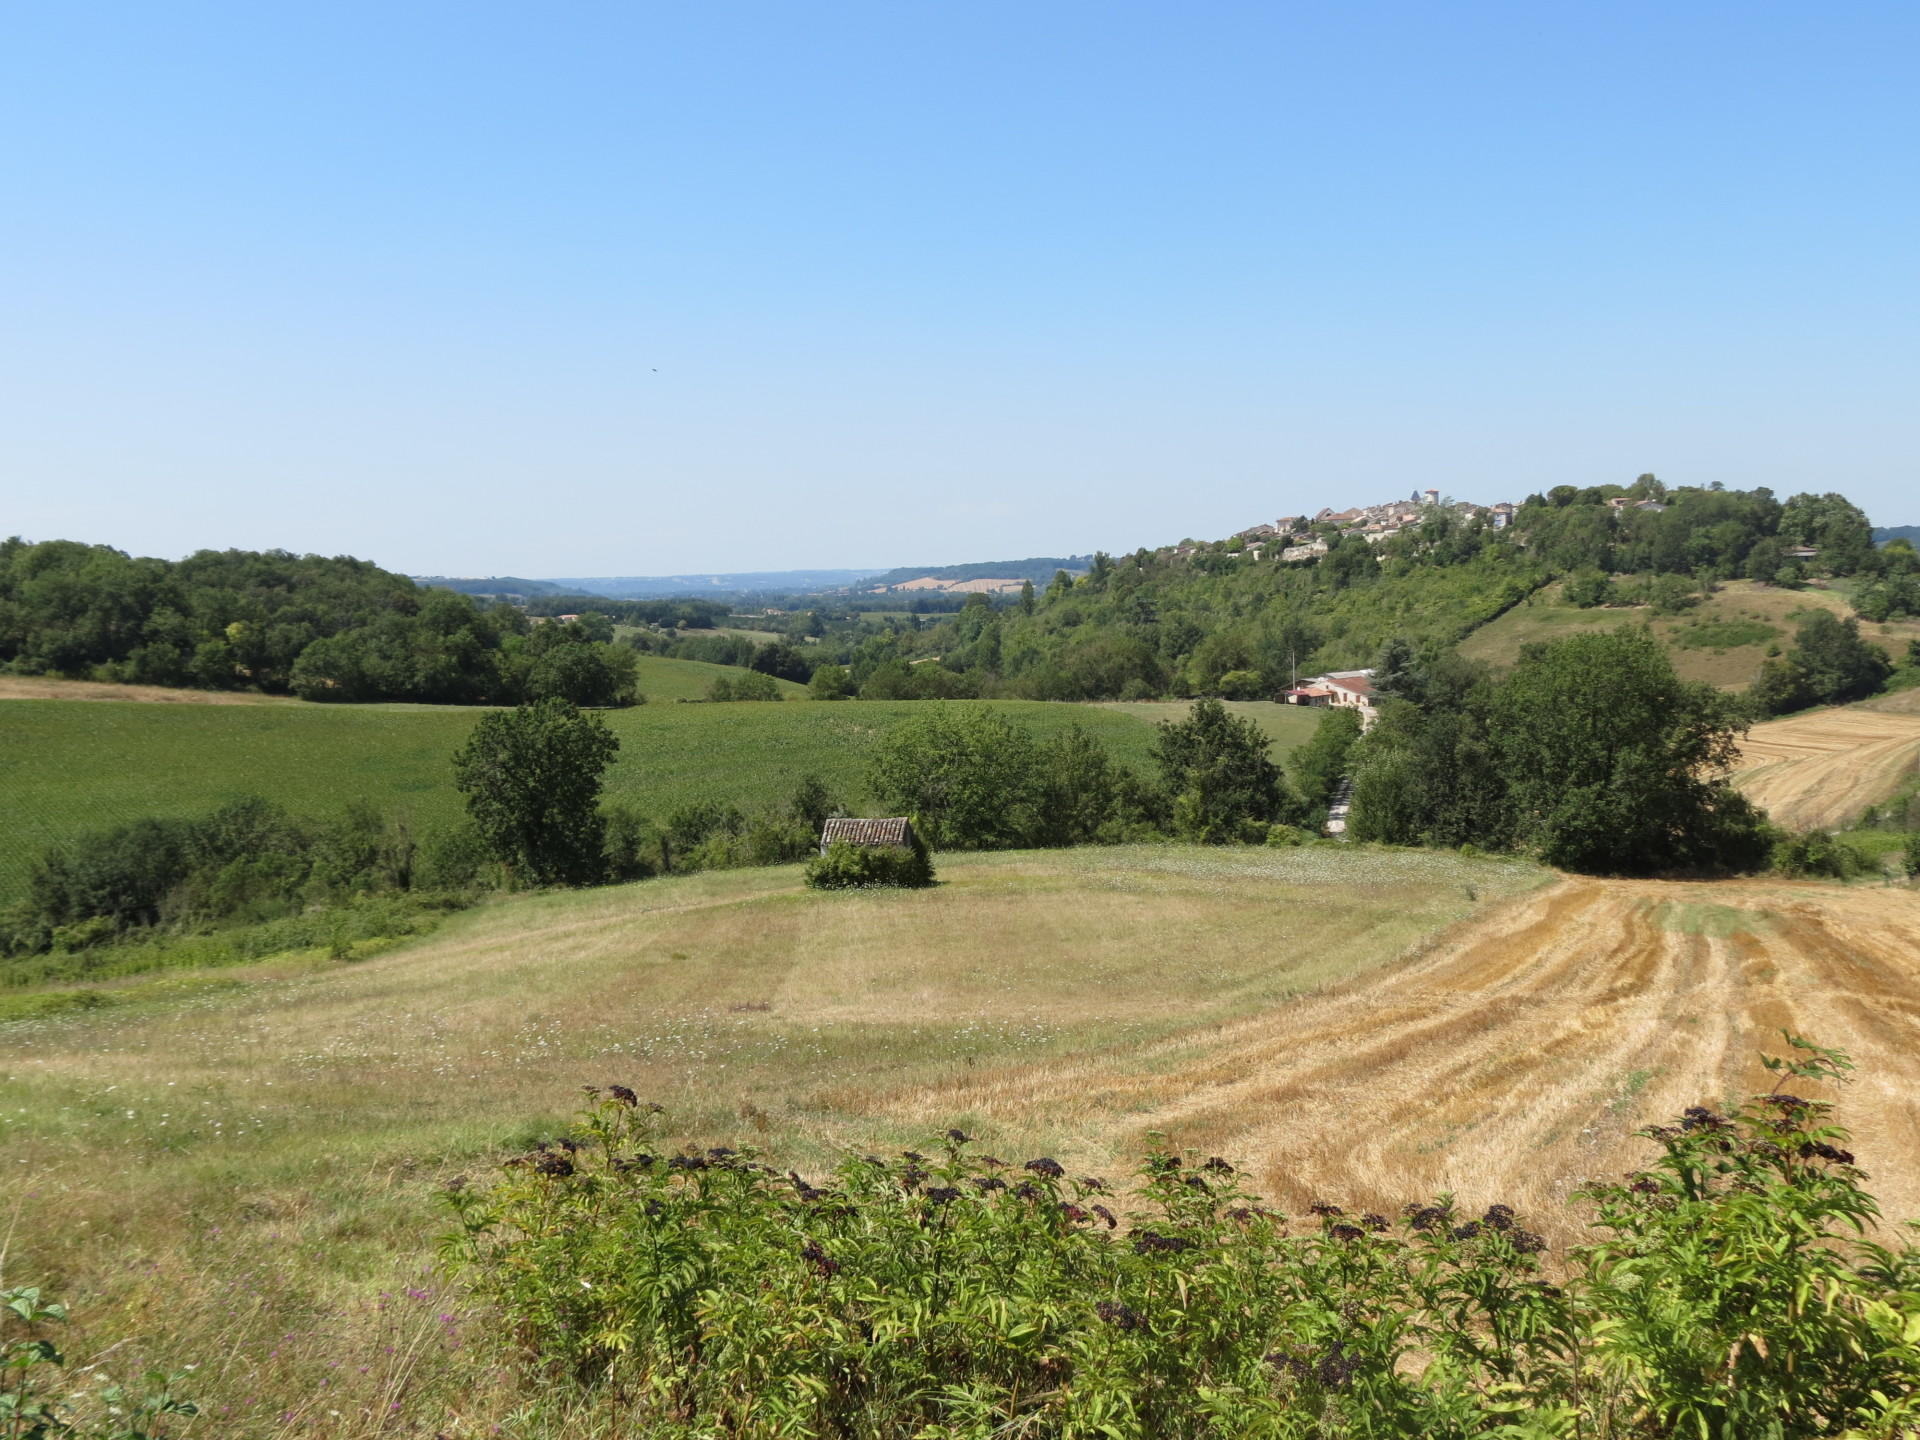 View near Puymirol